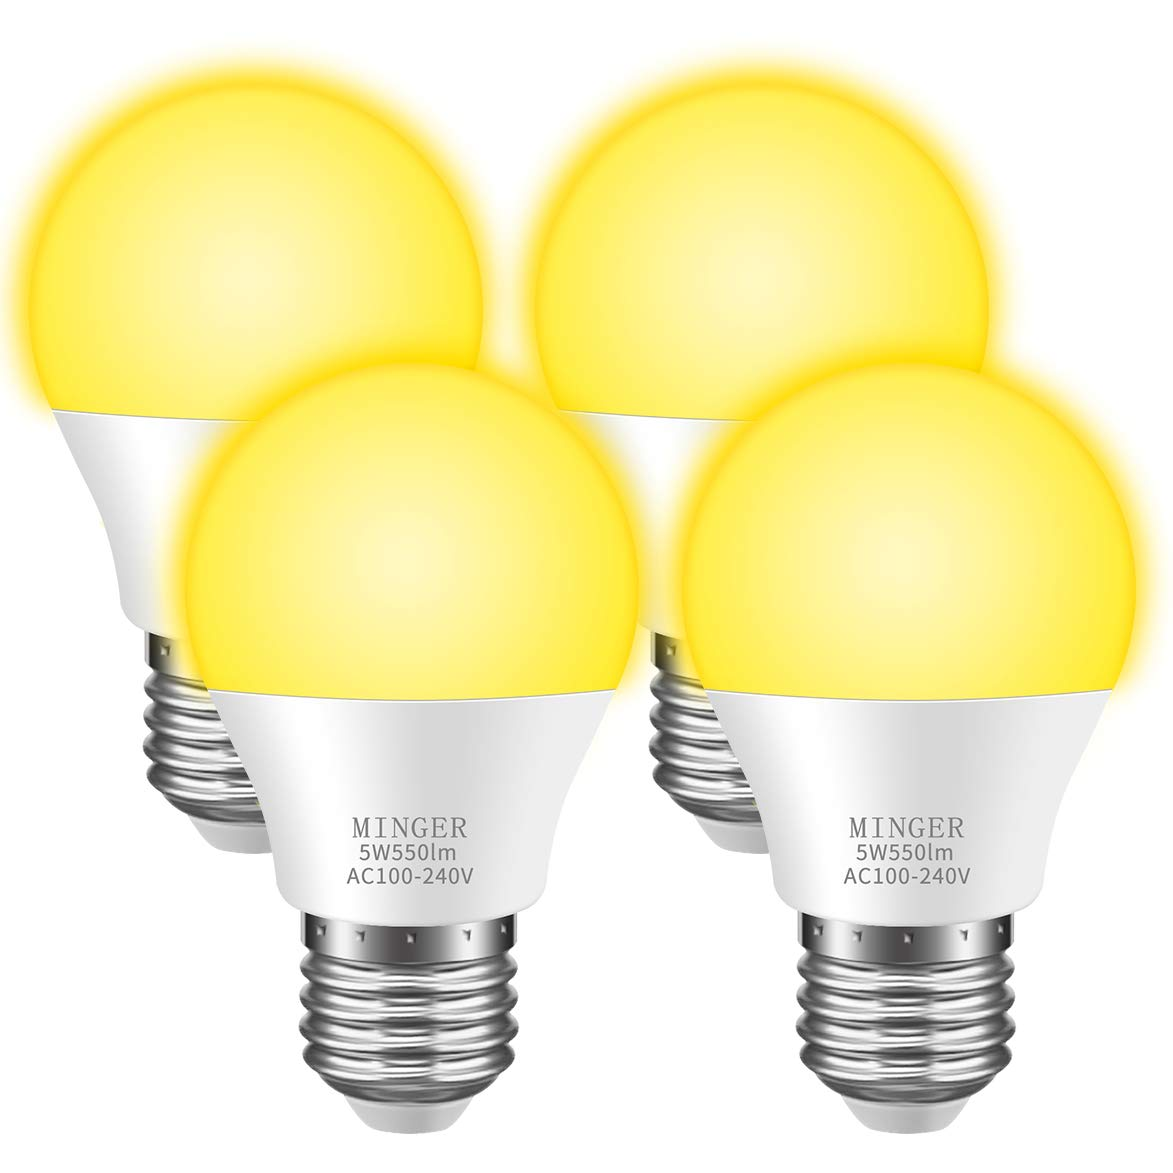 MINGER Bug Light Bulb Yellow LED Bulbs, Amber Bug Free Light Bulb Outdoor Porch Lights LED Warm Bulb 40W Equivalent (5W 550Lumens E26/E27), Outdoor Lighting Lamp for Patio Hallway Garage [4 Pack]